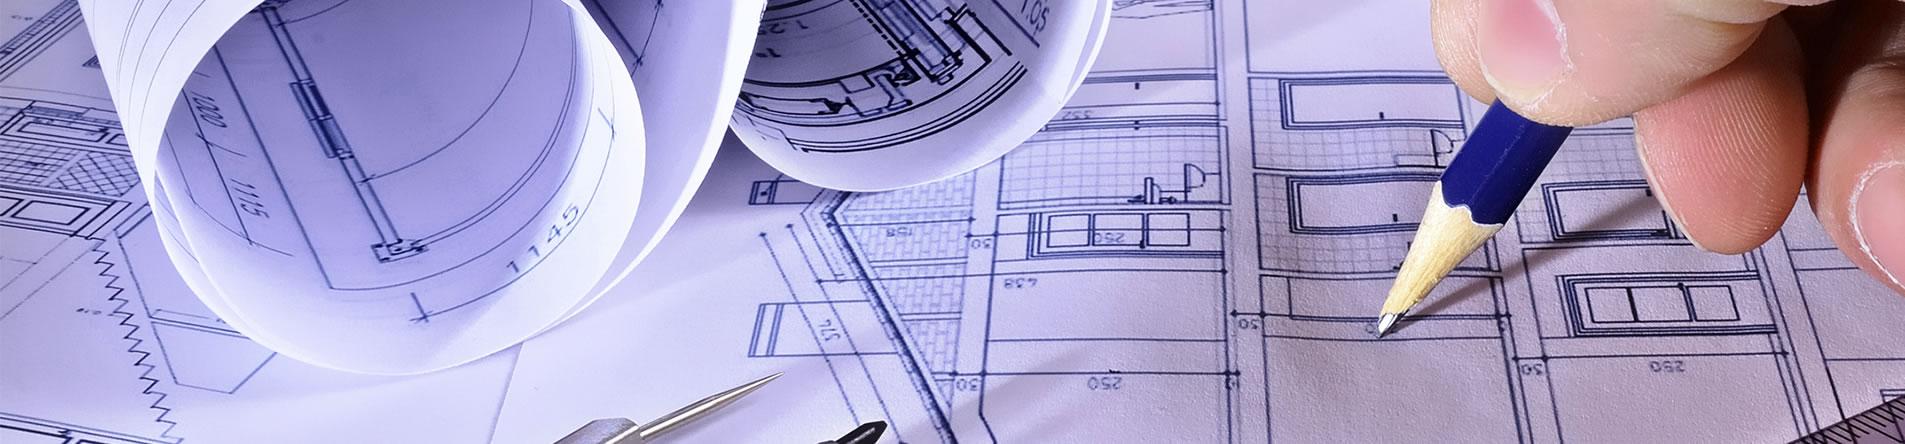 Build A Home Header